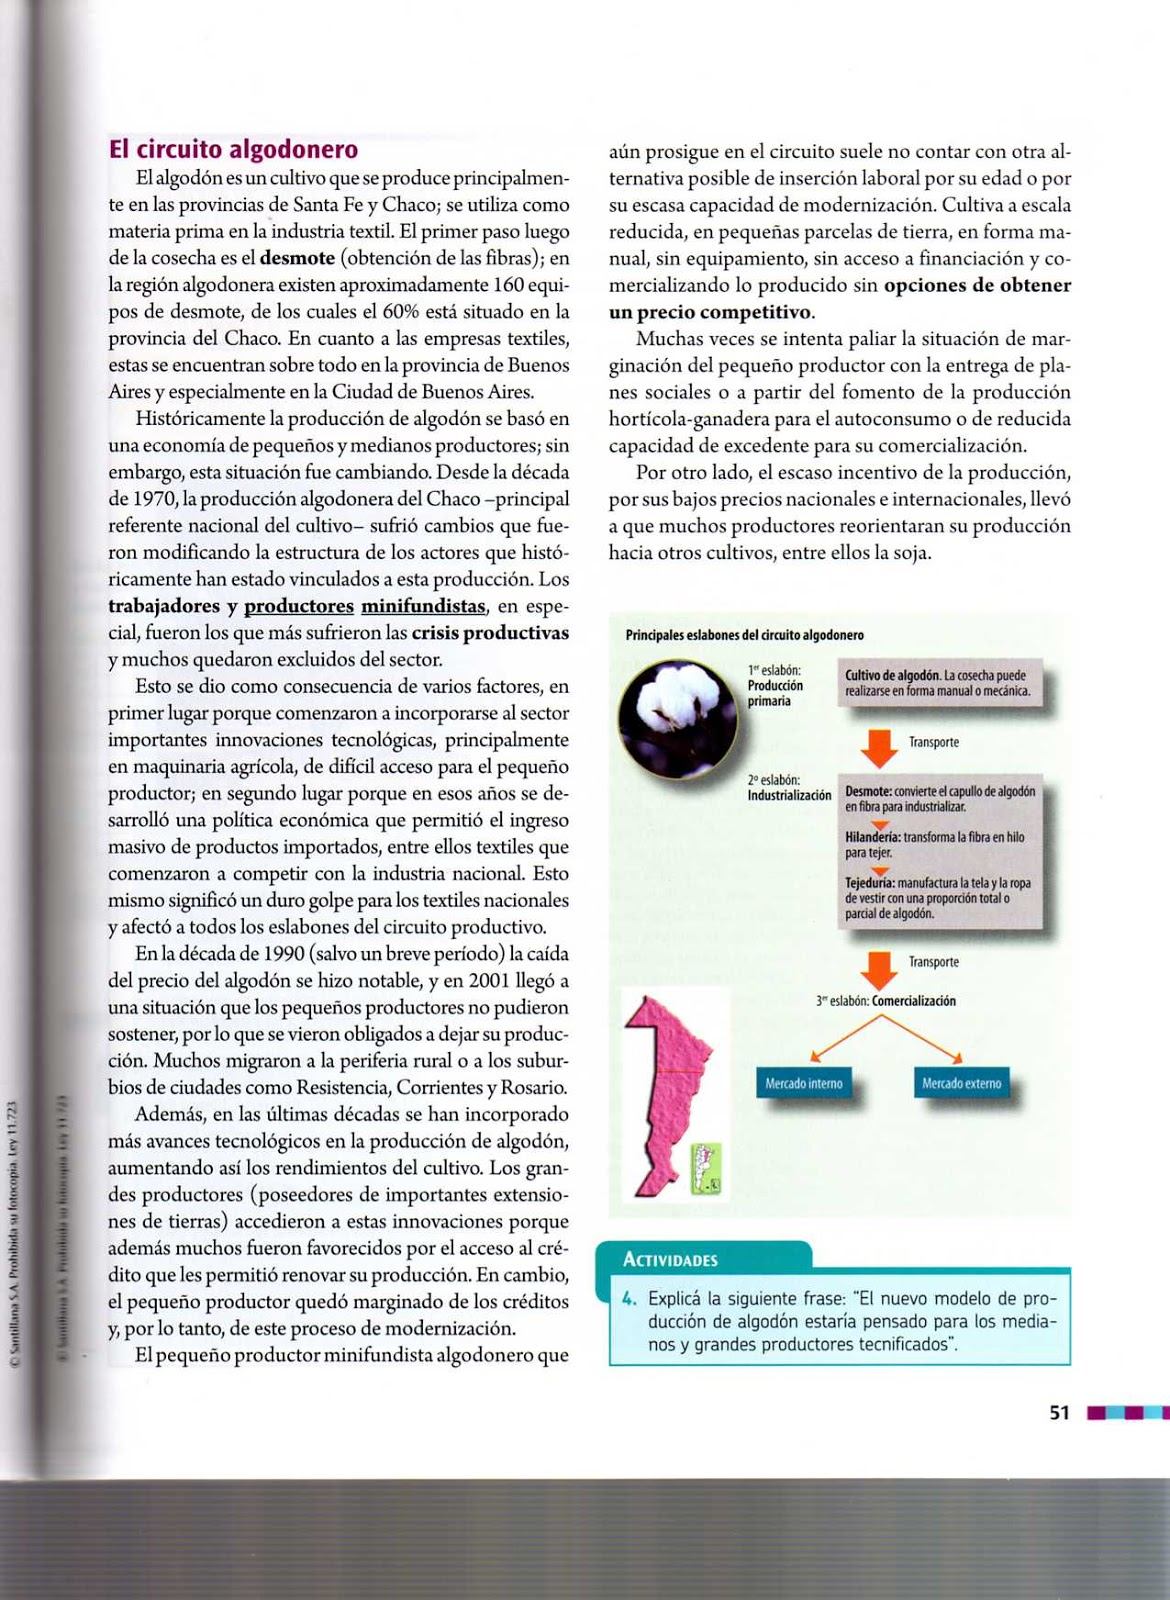 Circuito Productivo De La Caña De Azucar : Secundaria n° 3 de quilmes virtual: circuitos productivos extra